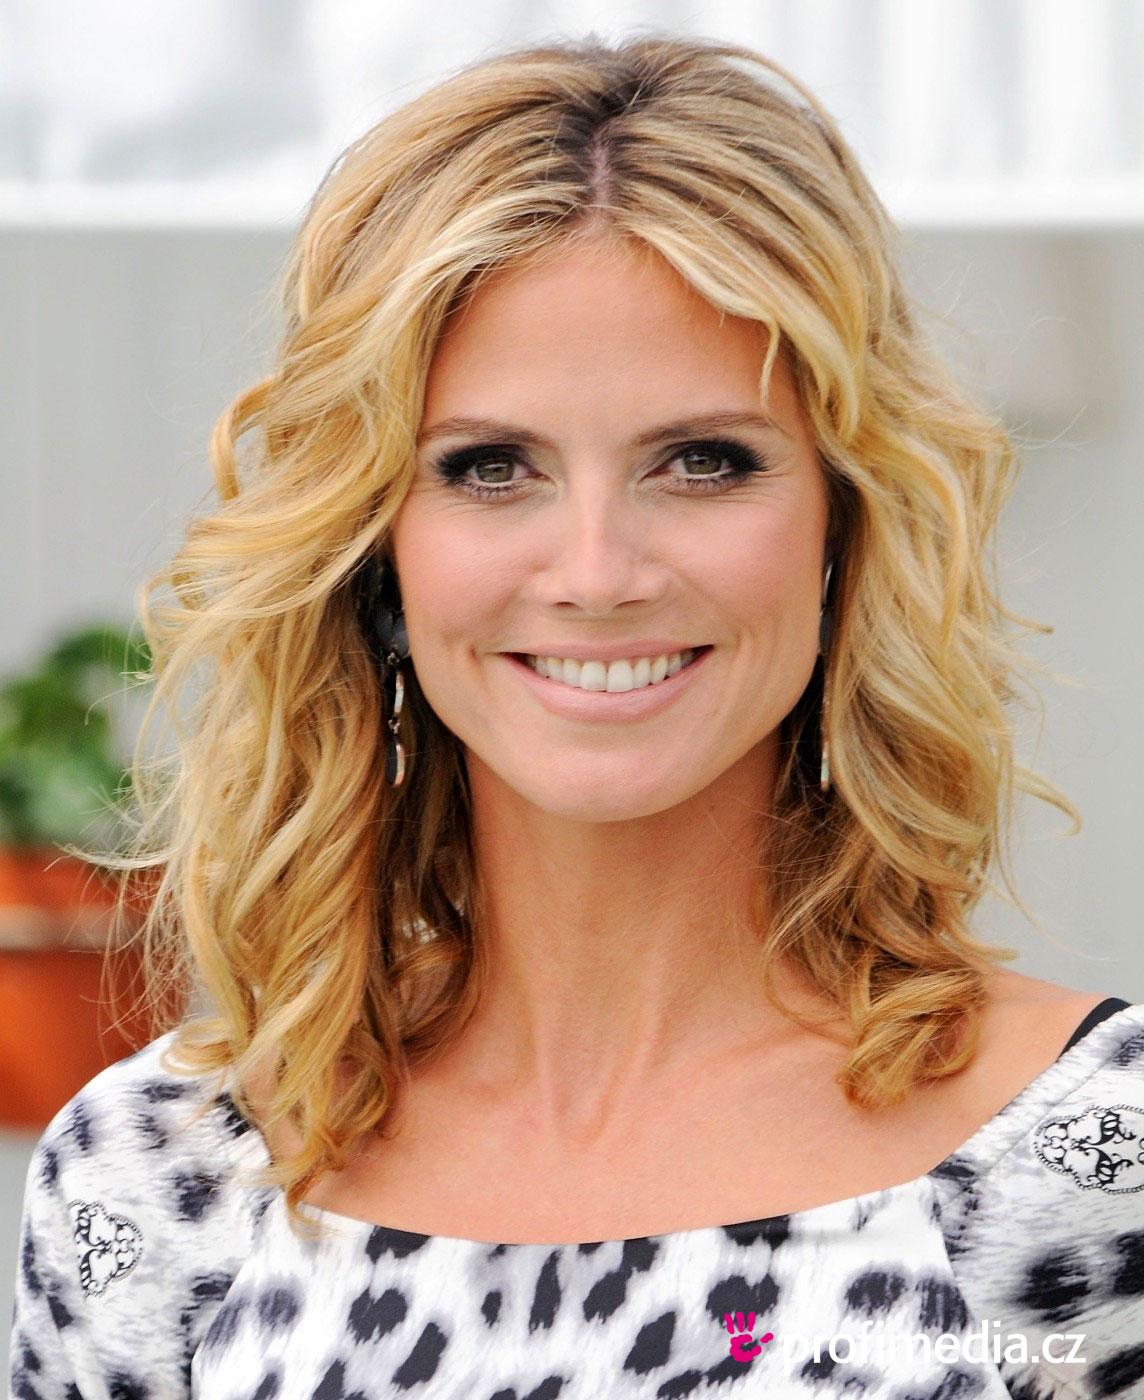 Heidi Klum Hairstyle Easyhairstyler